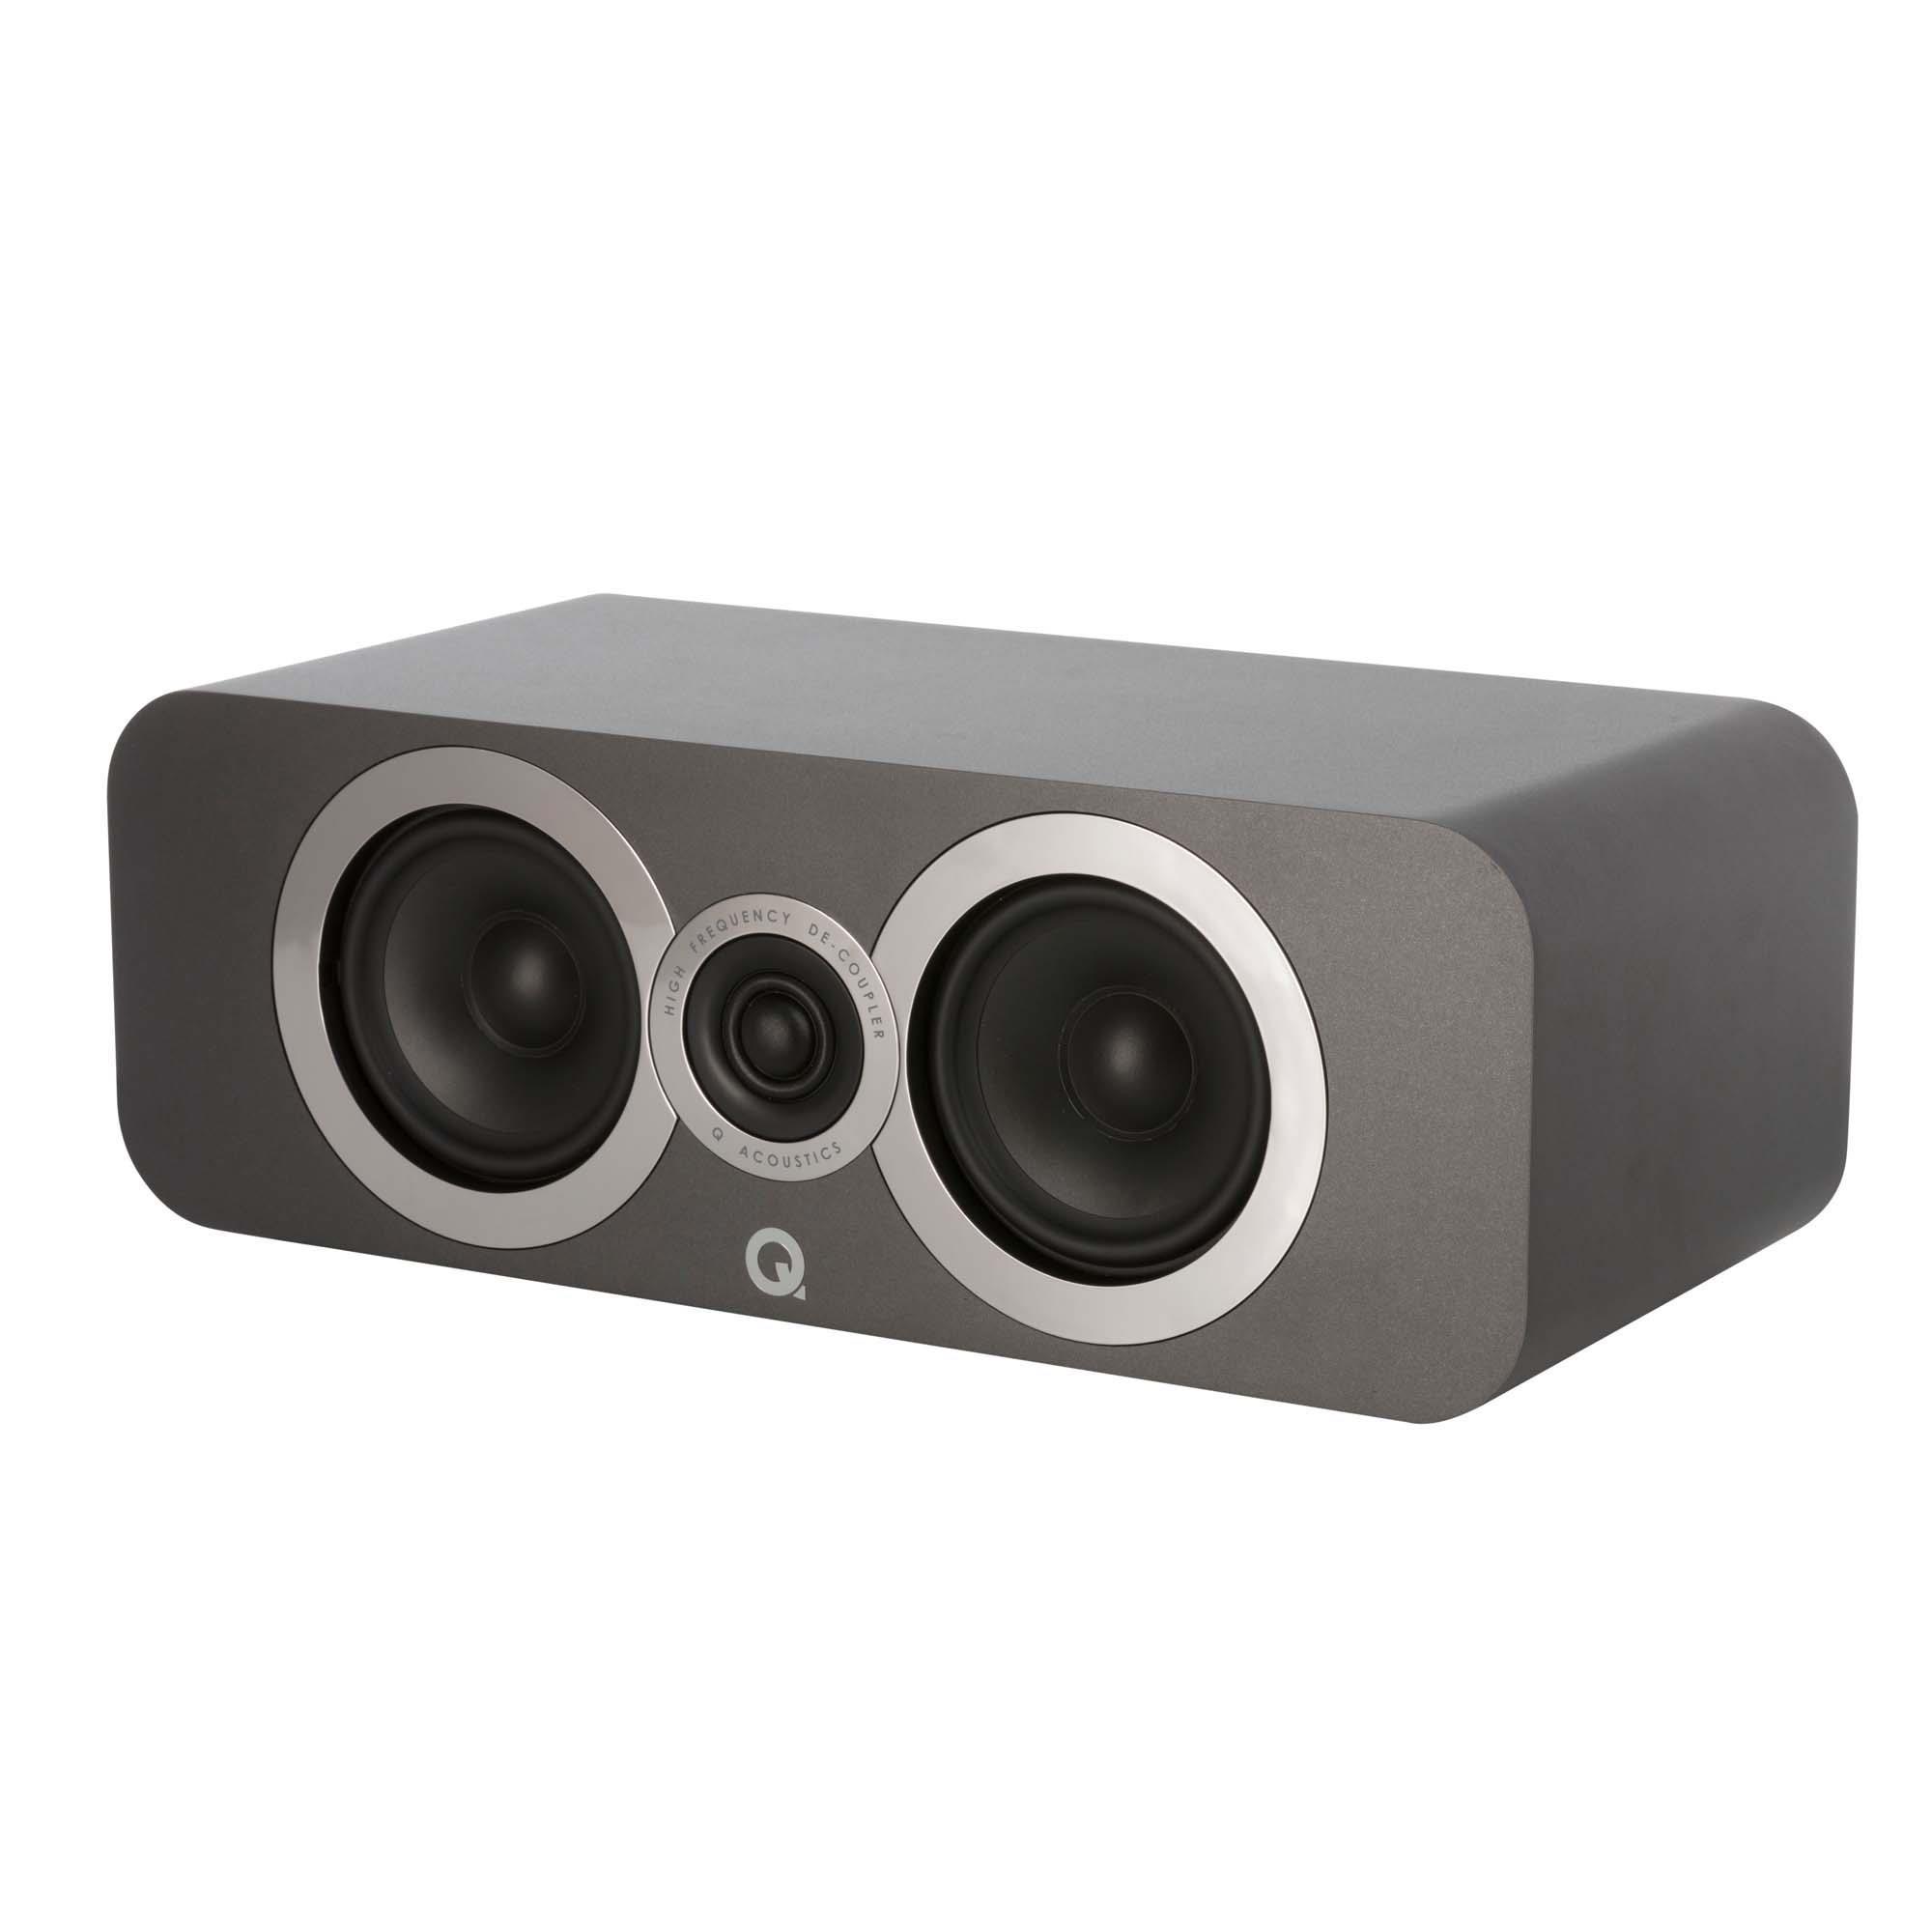 Q Acoustics 3090Ci Centre Speaker £119 delivered at Sevenoaks Sounds